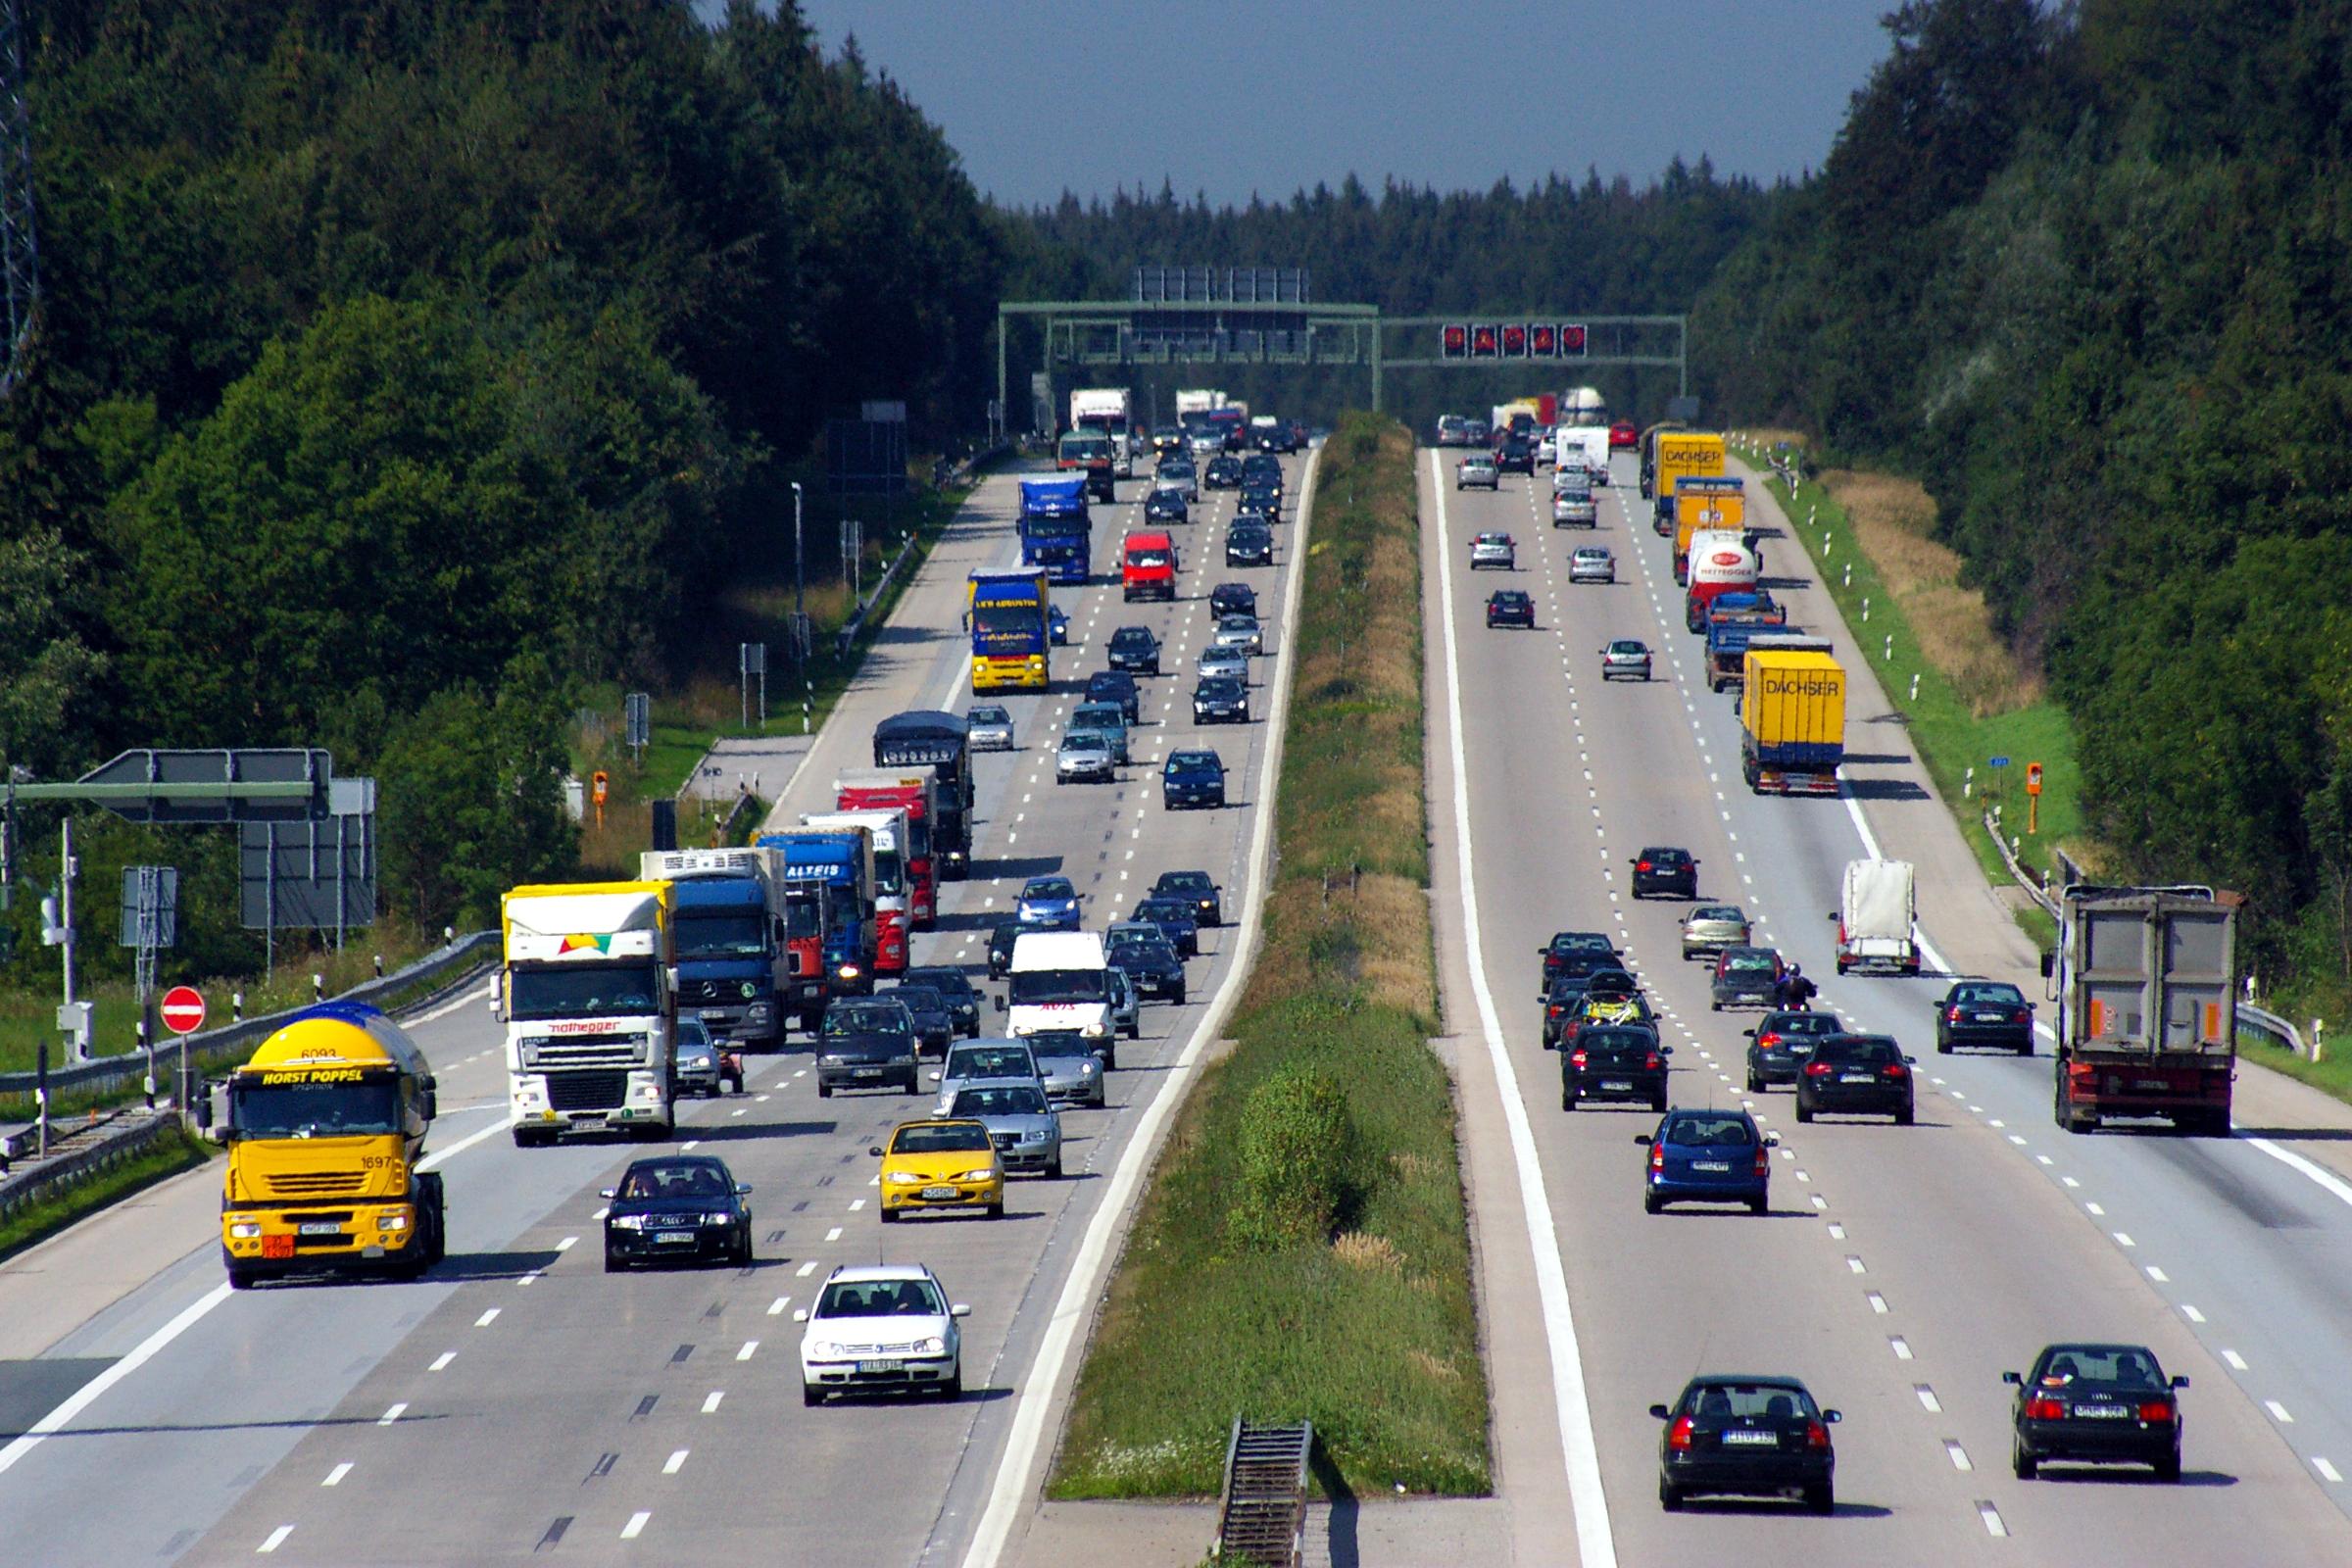 Fileautobahn a8 bei holzkirchenjpg wikimedia commons for Holz küchen